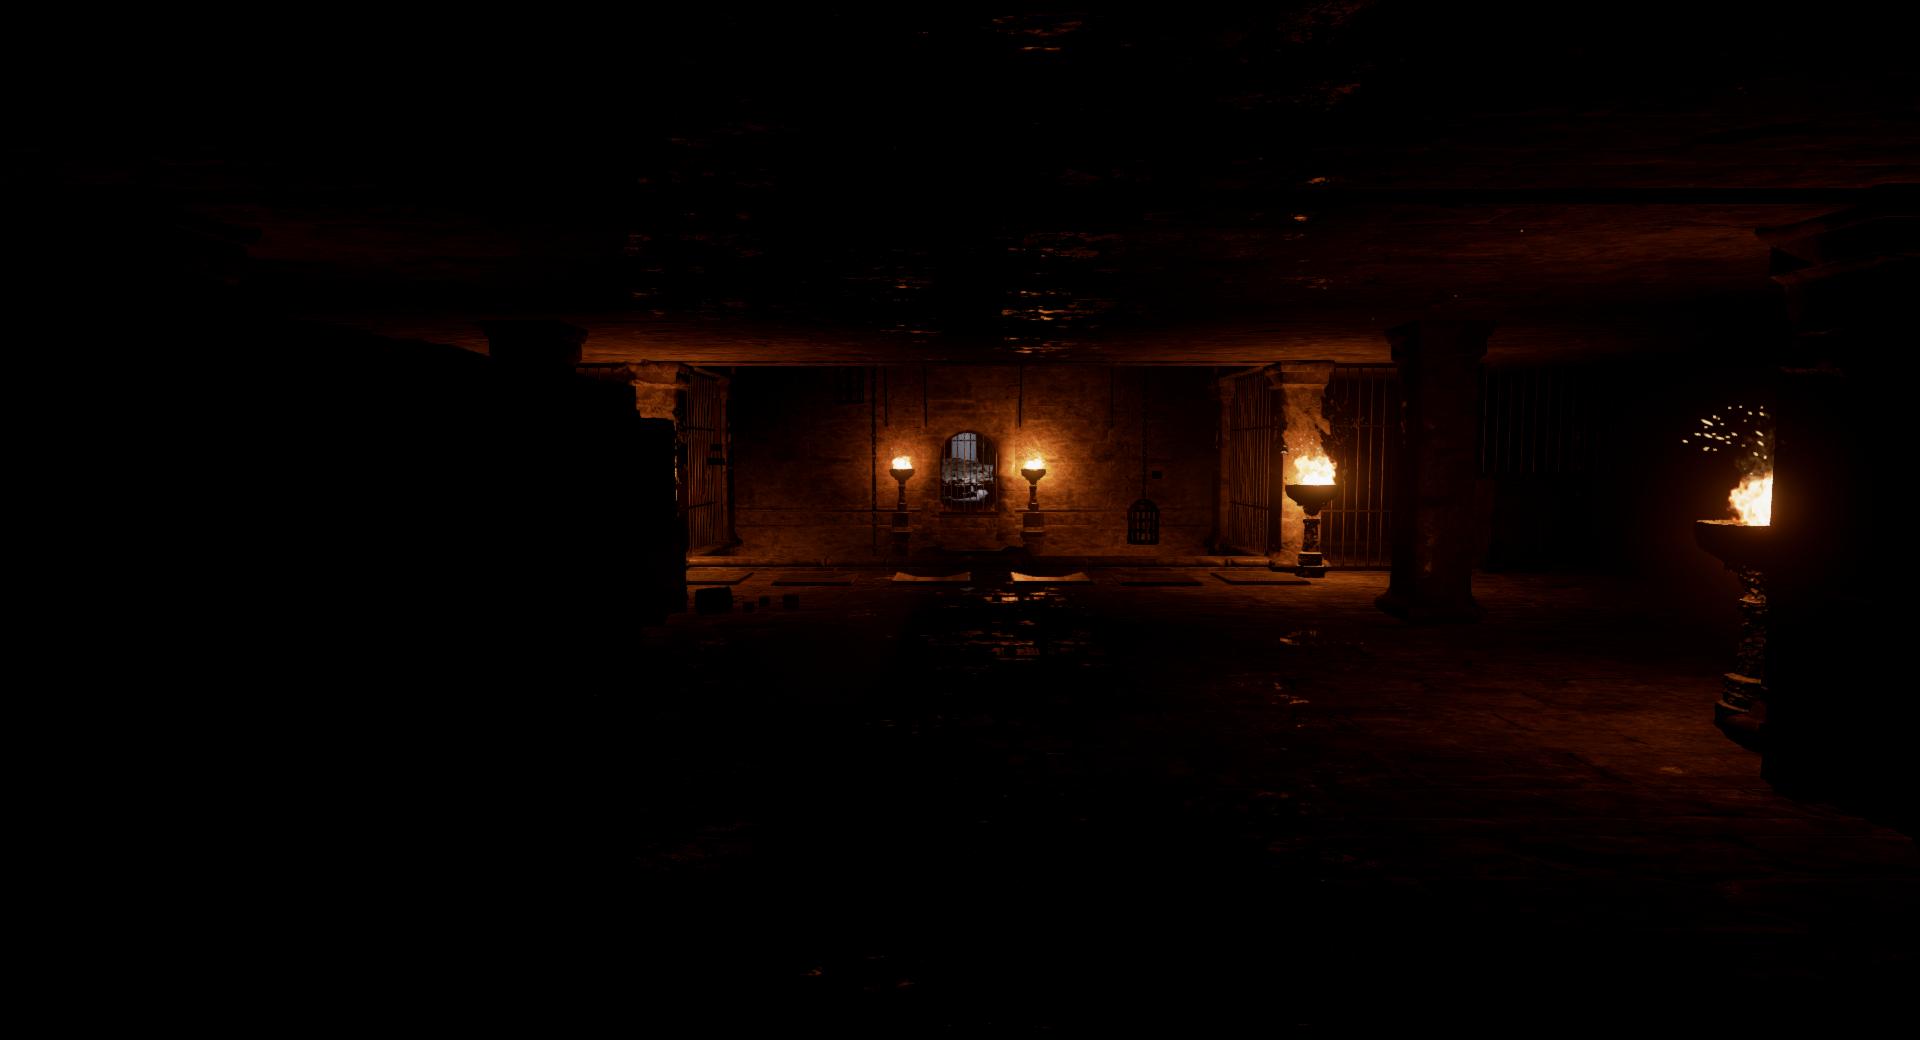 New Room Screenshot 2/3